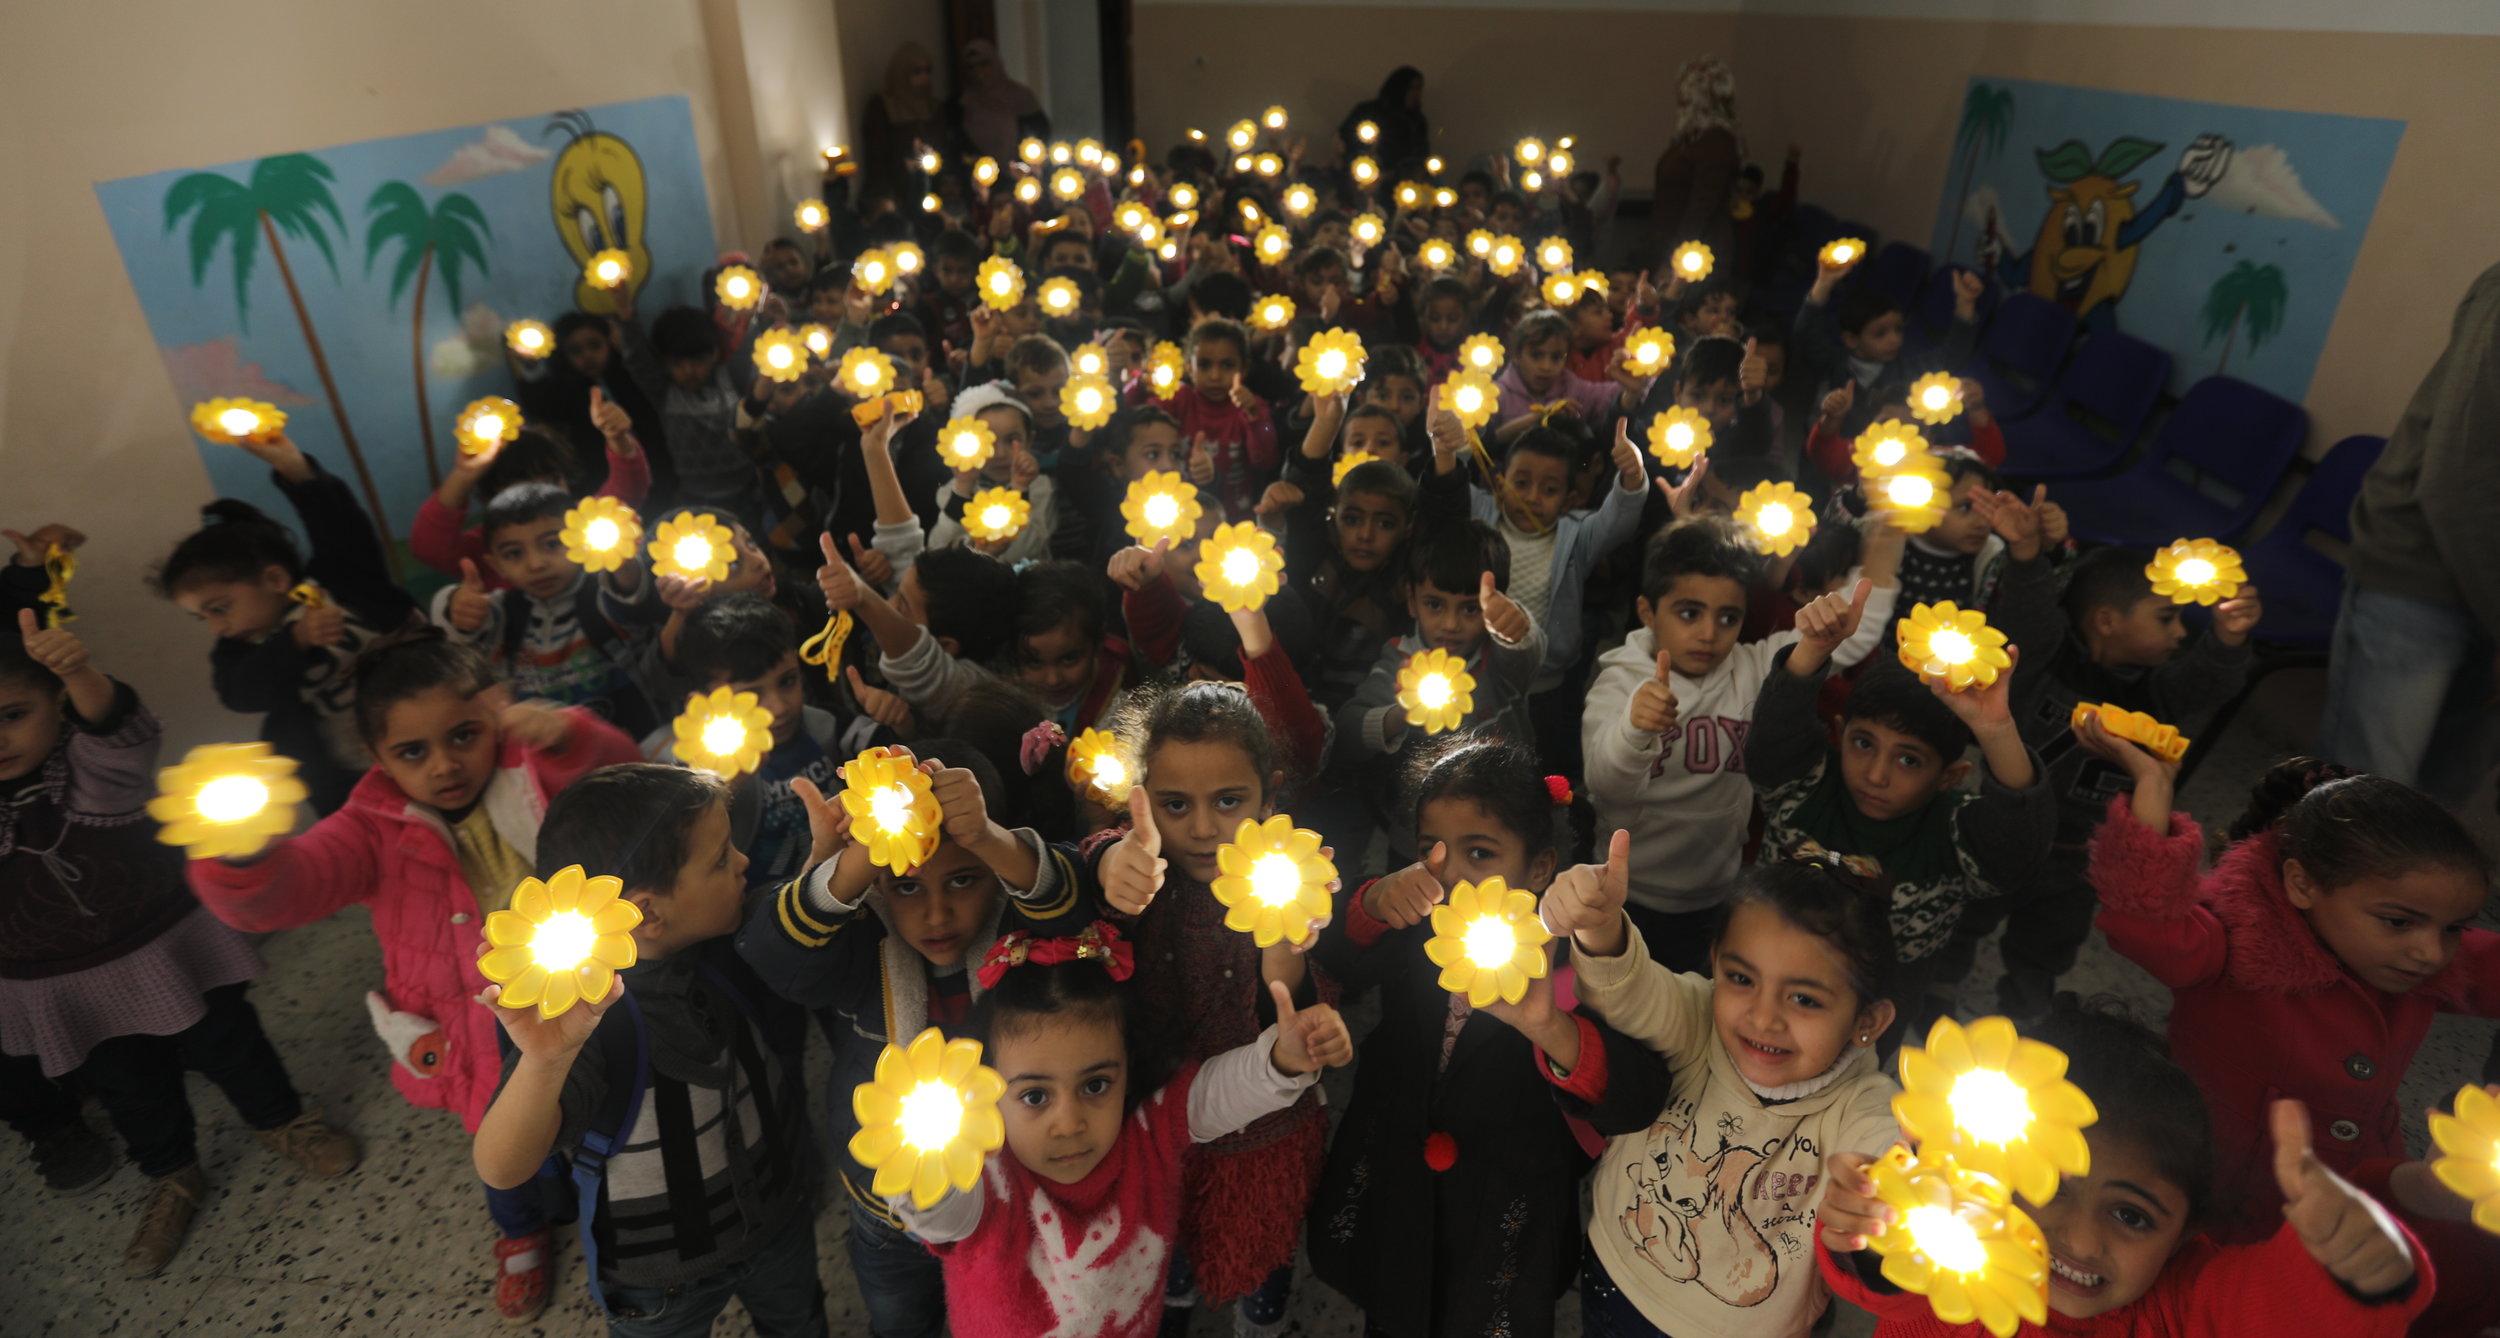 A_lot_of_lights_cropped.jpeg